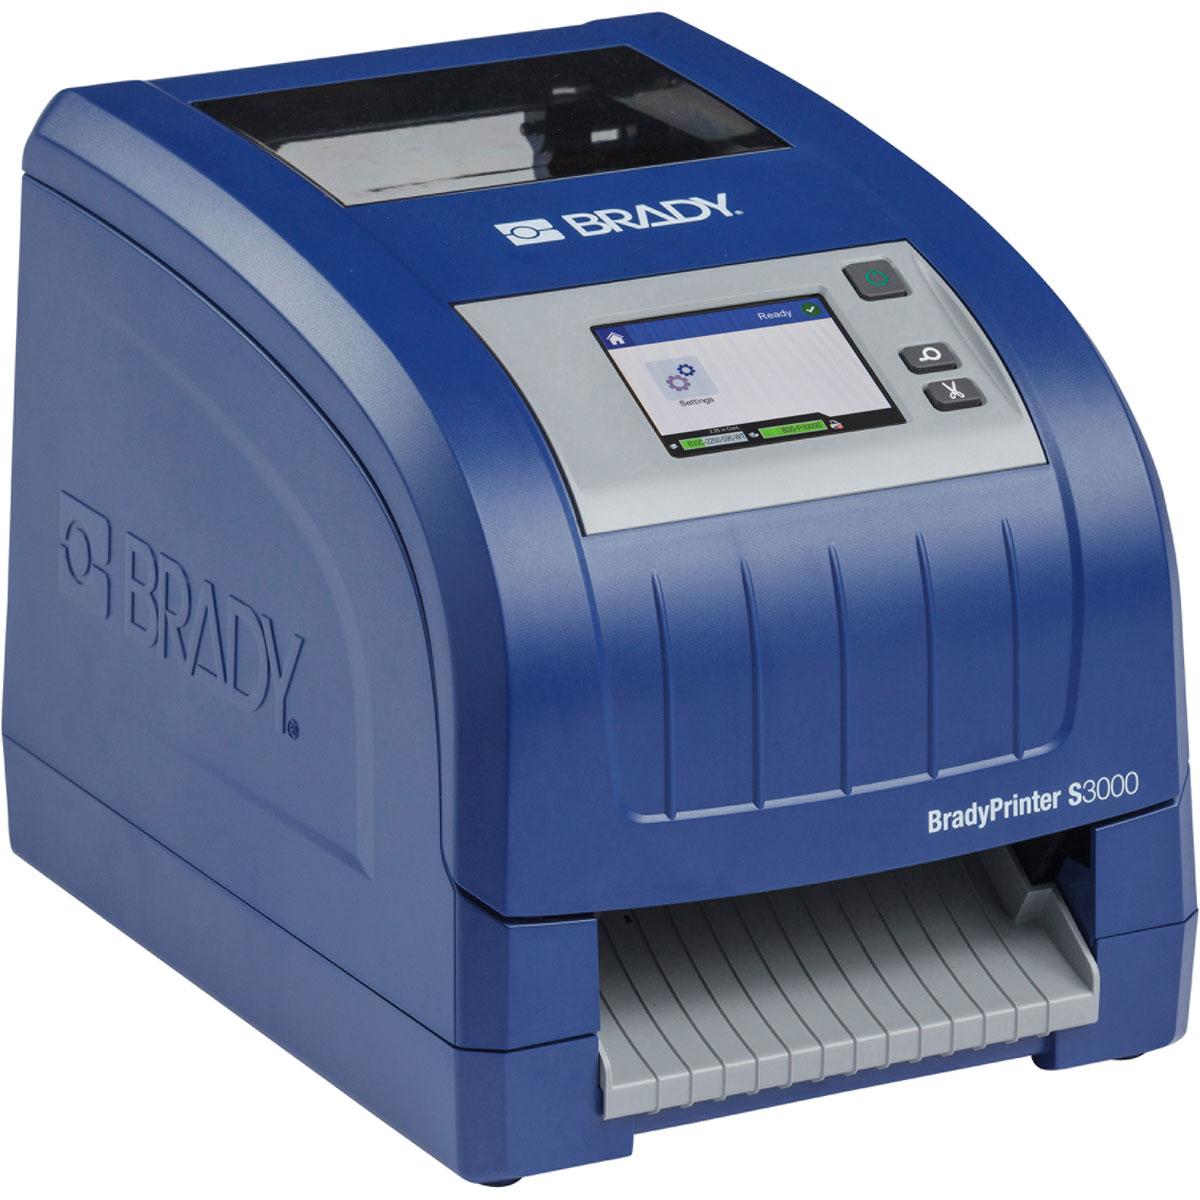 BradyPrinter S3000 Signs and Label Printer